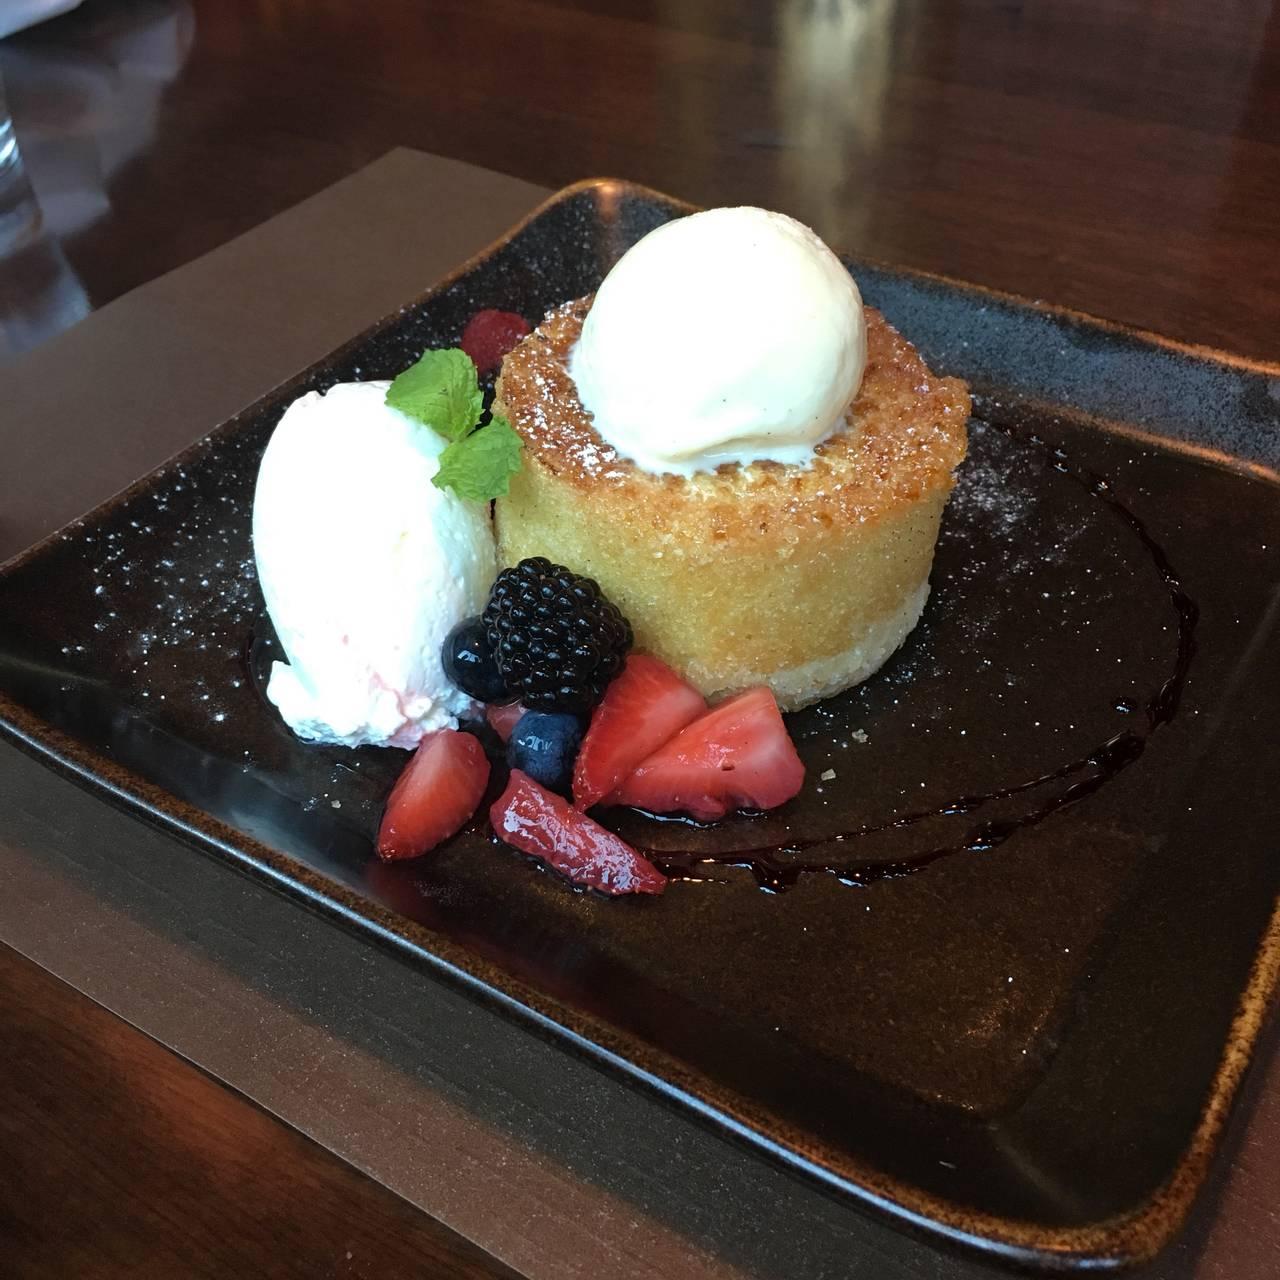 Rocksugar Southeast Asian Kitchen Oak Brook Restaurant Tous Les Jours Strawberry Fresh Cream Cake 2 E Voucher Il Opentable